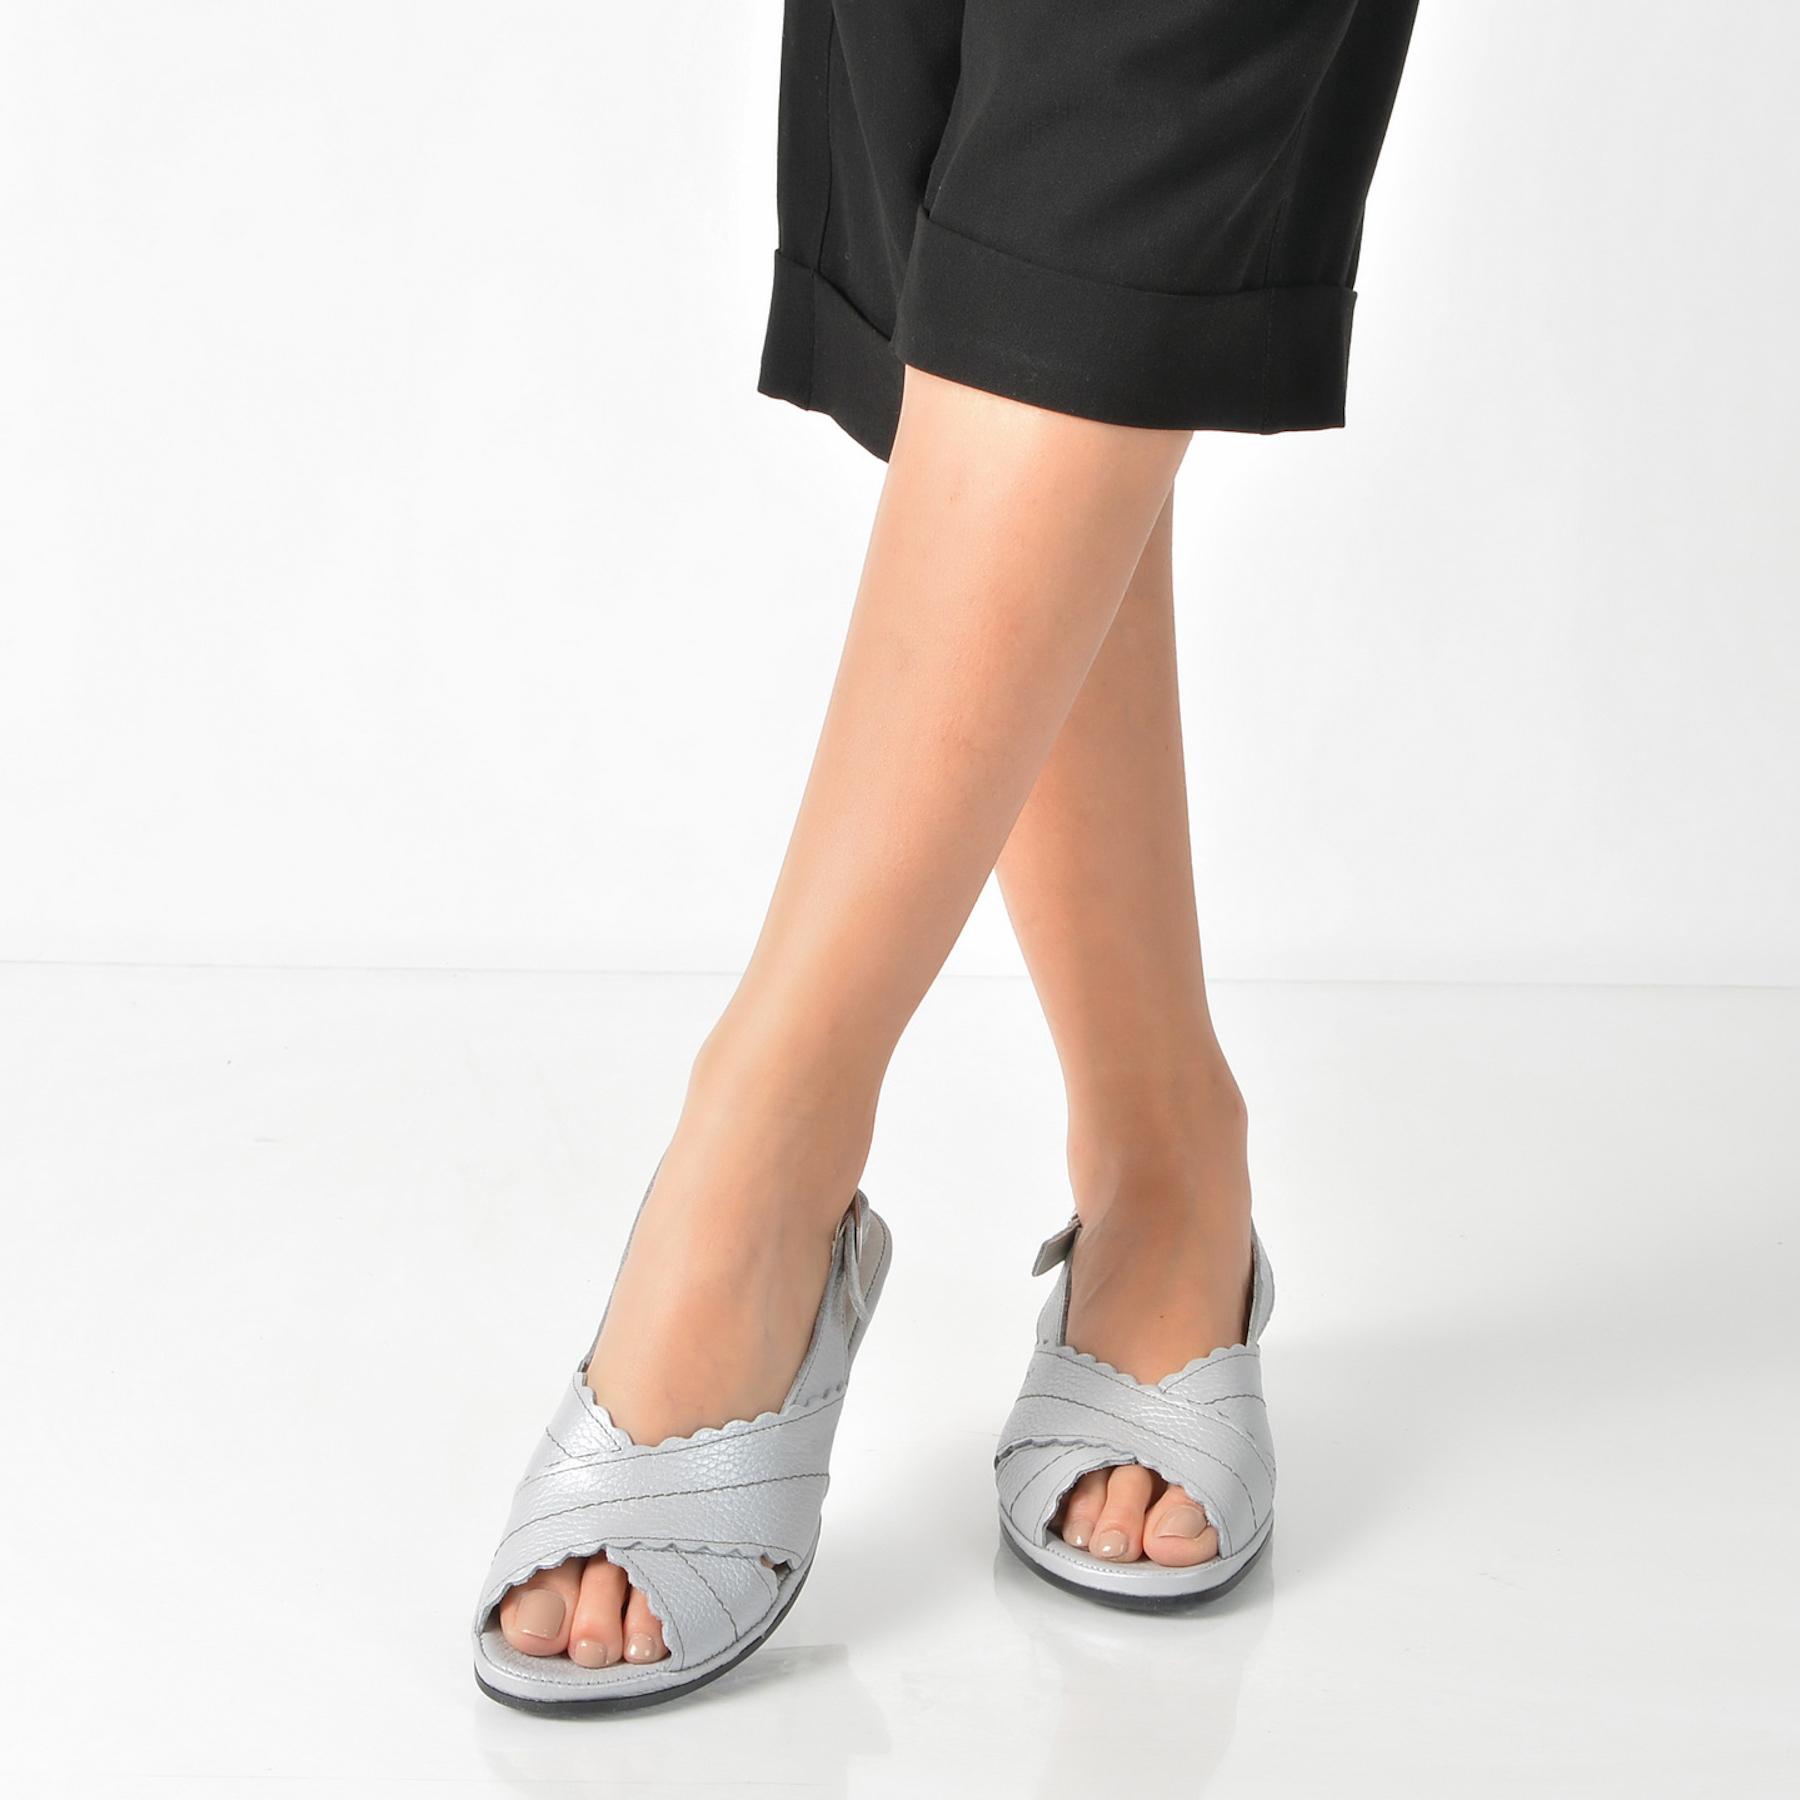 Sandale Suave Gri, 0817t, Din Piele Naturala